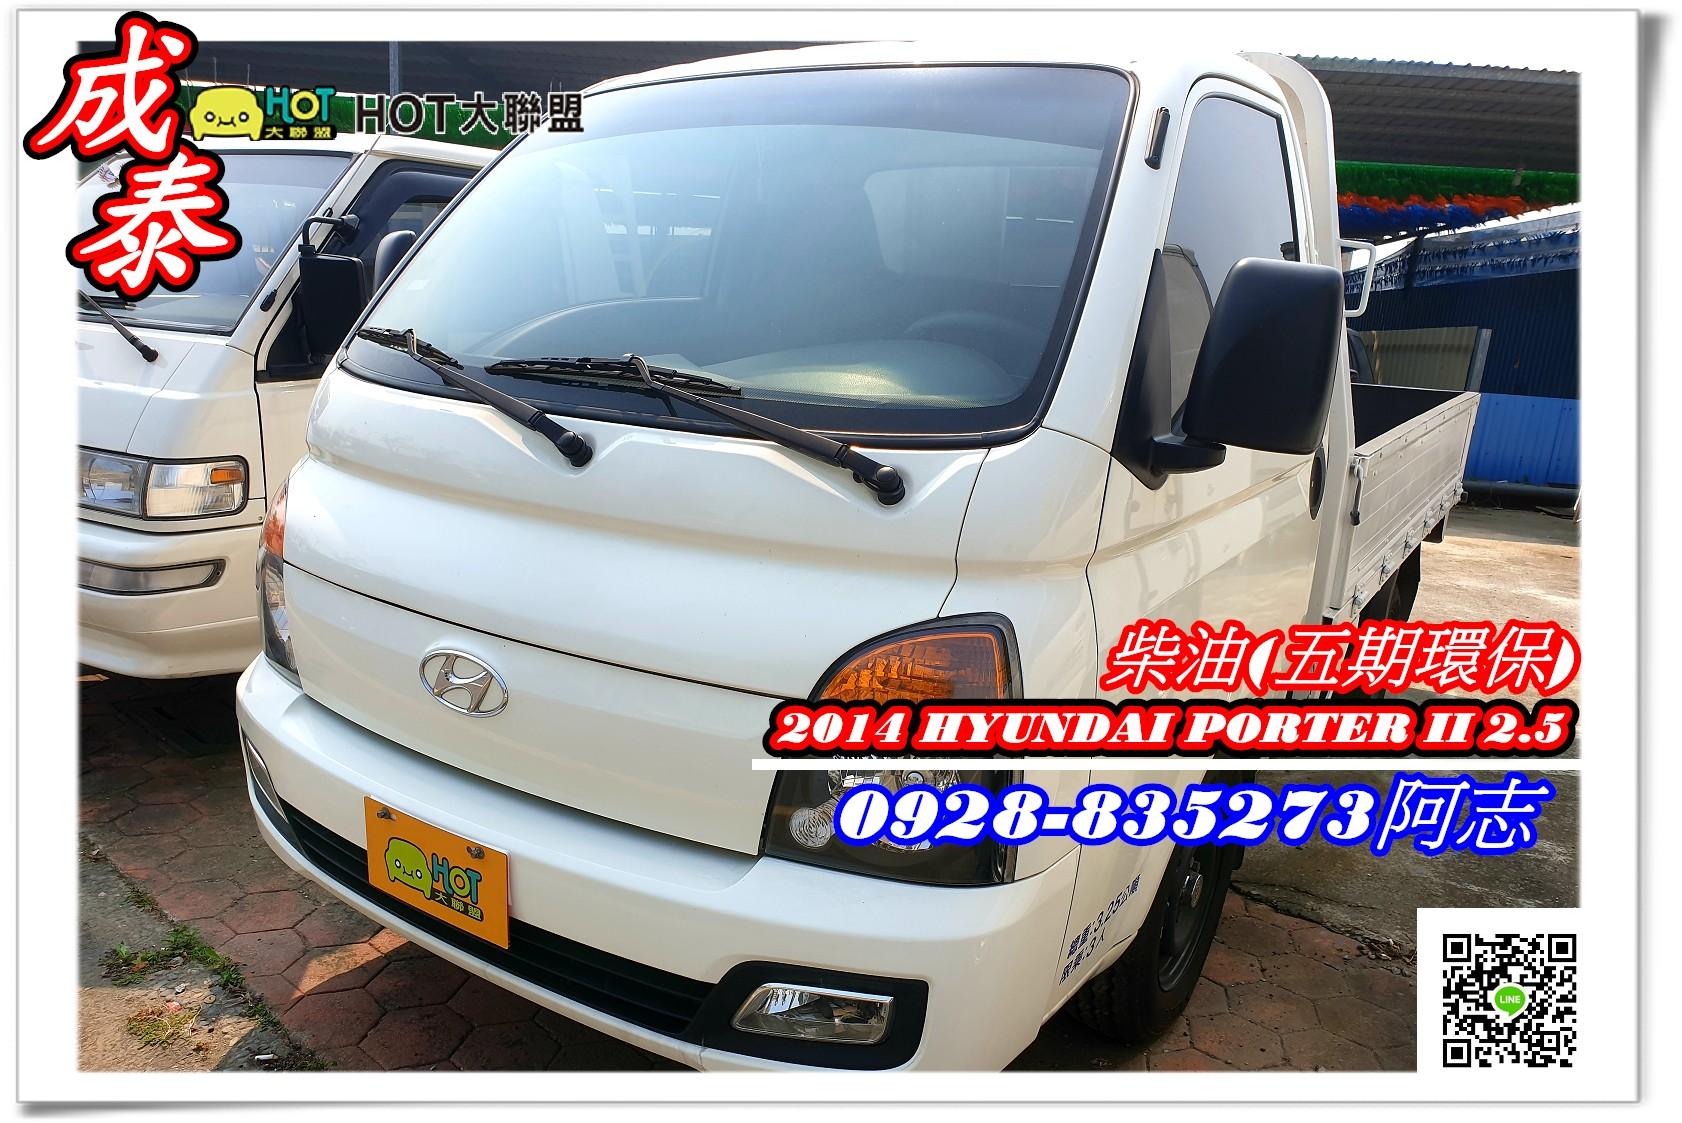 2014 Hyundai Porter